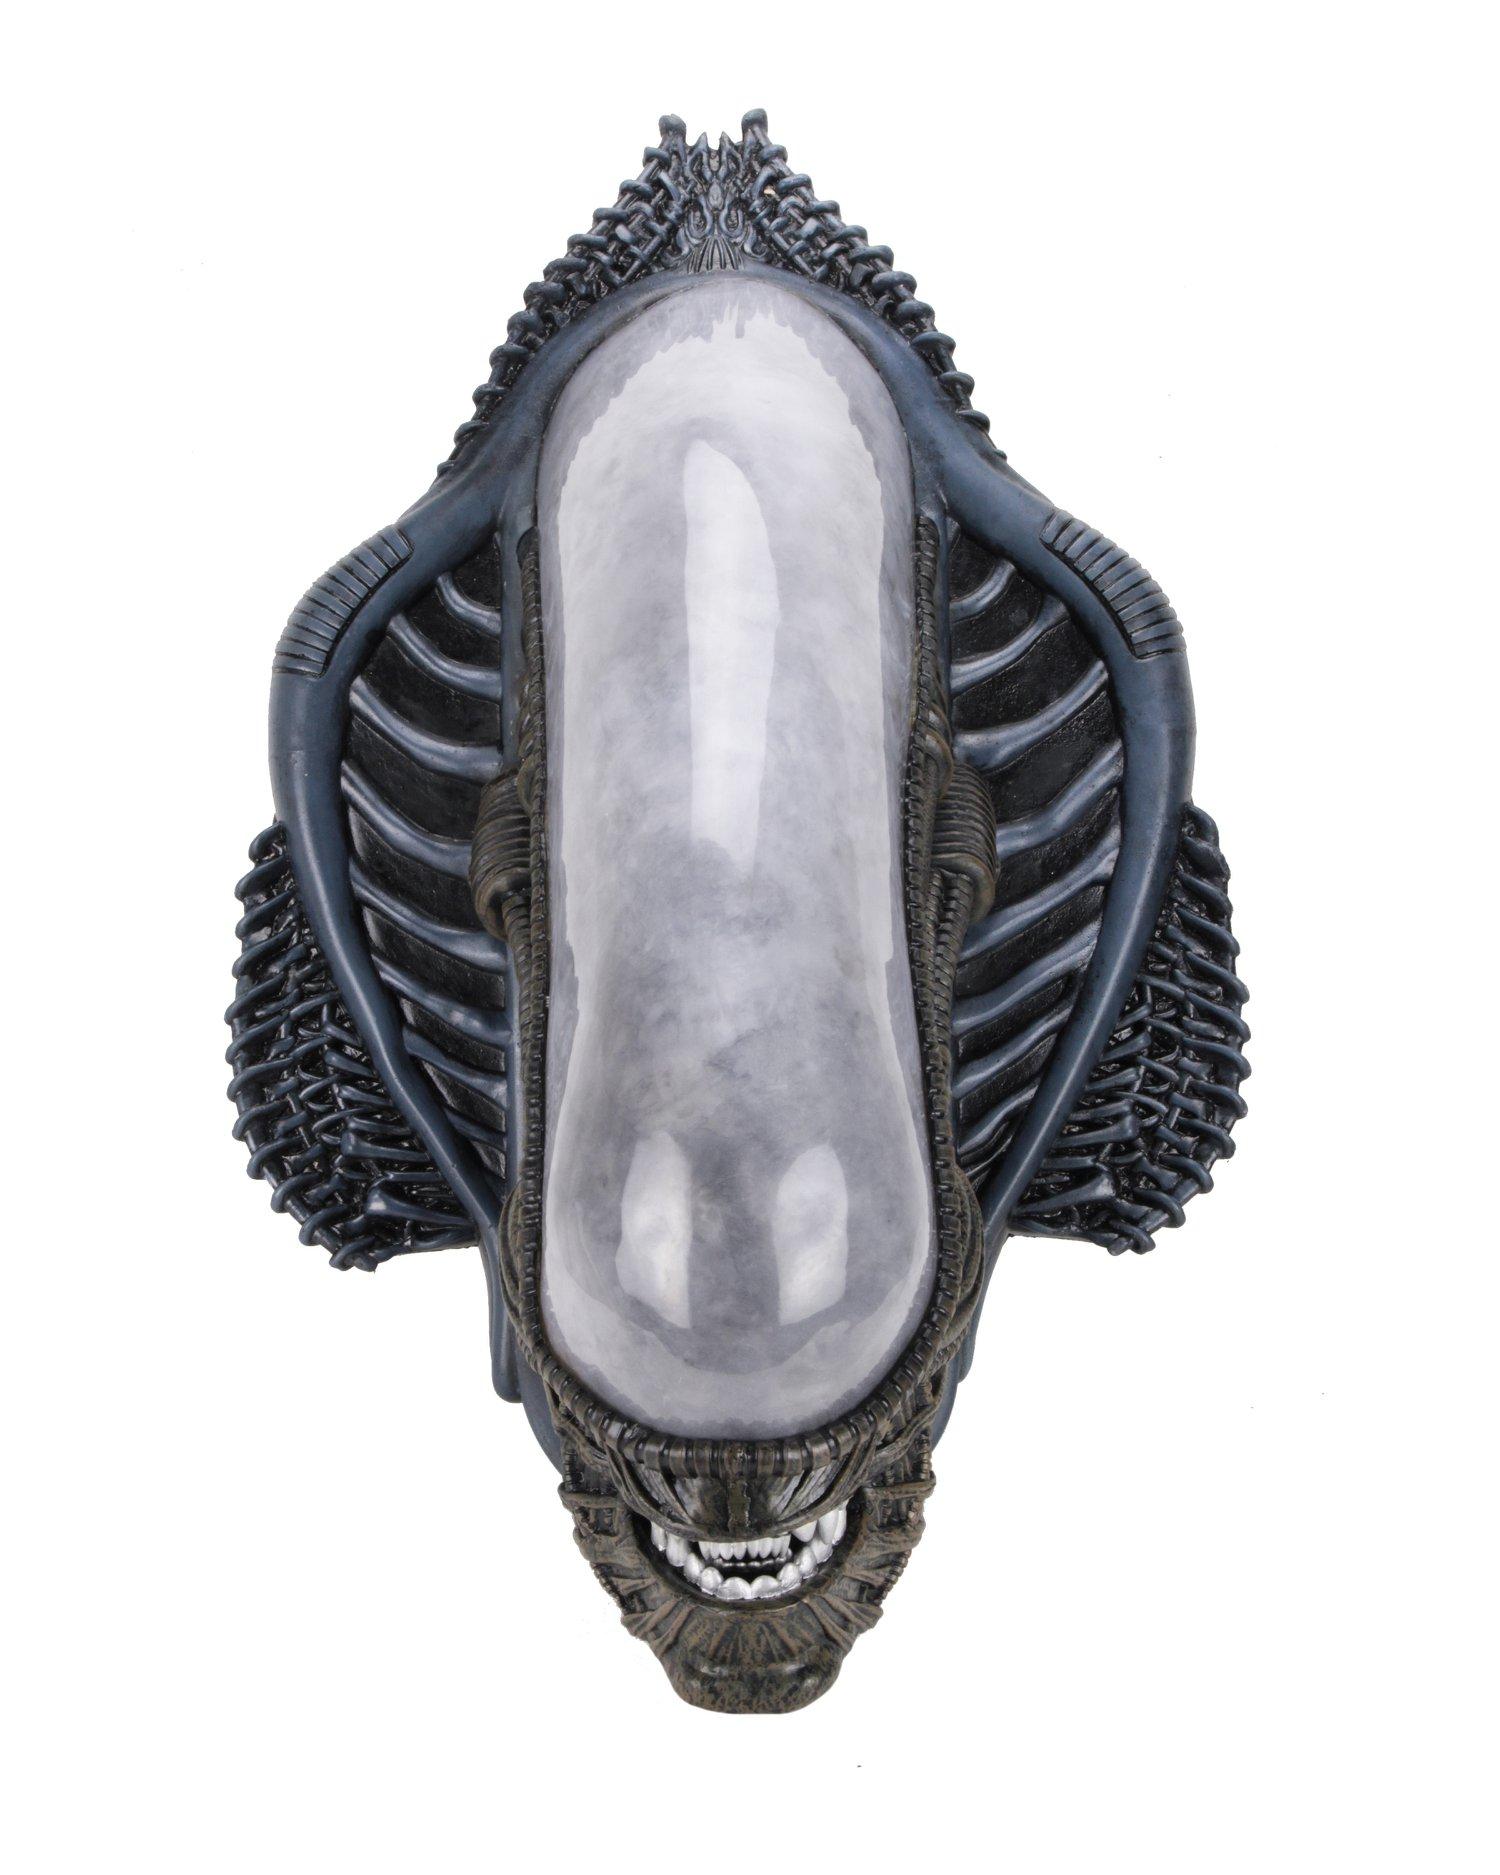 NECA Toys Predator & Alien Xenomorph Wall-Mounted Bust